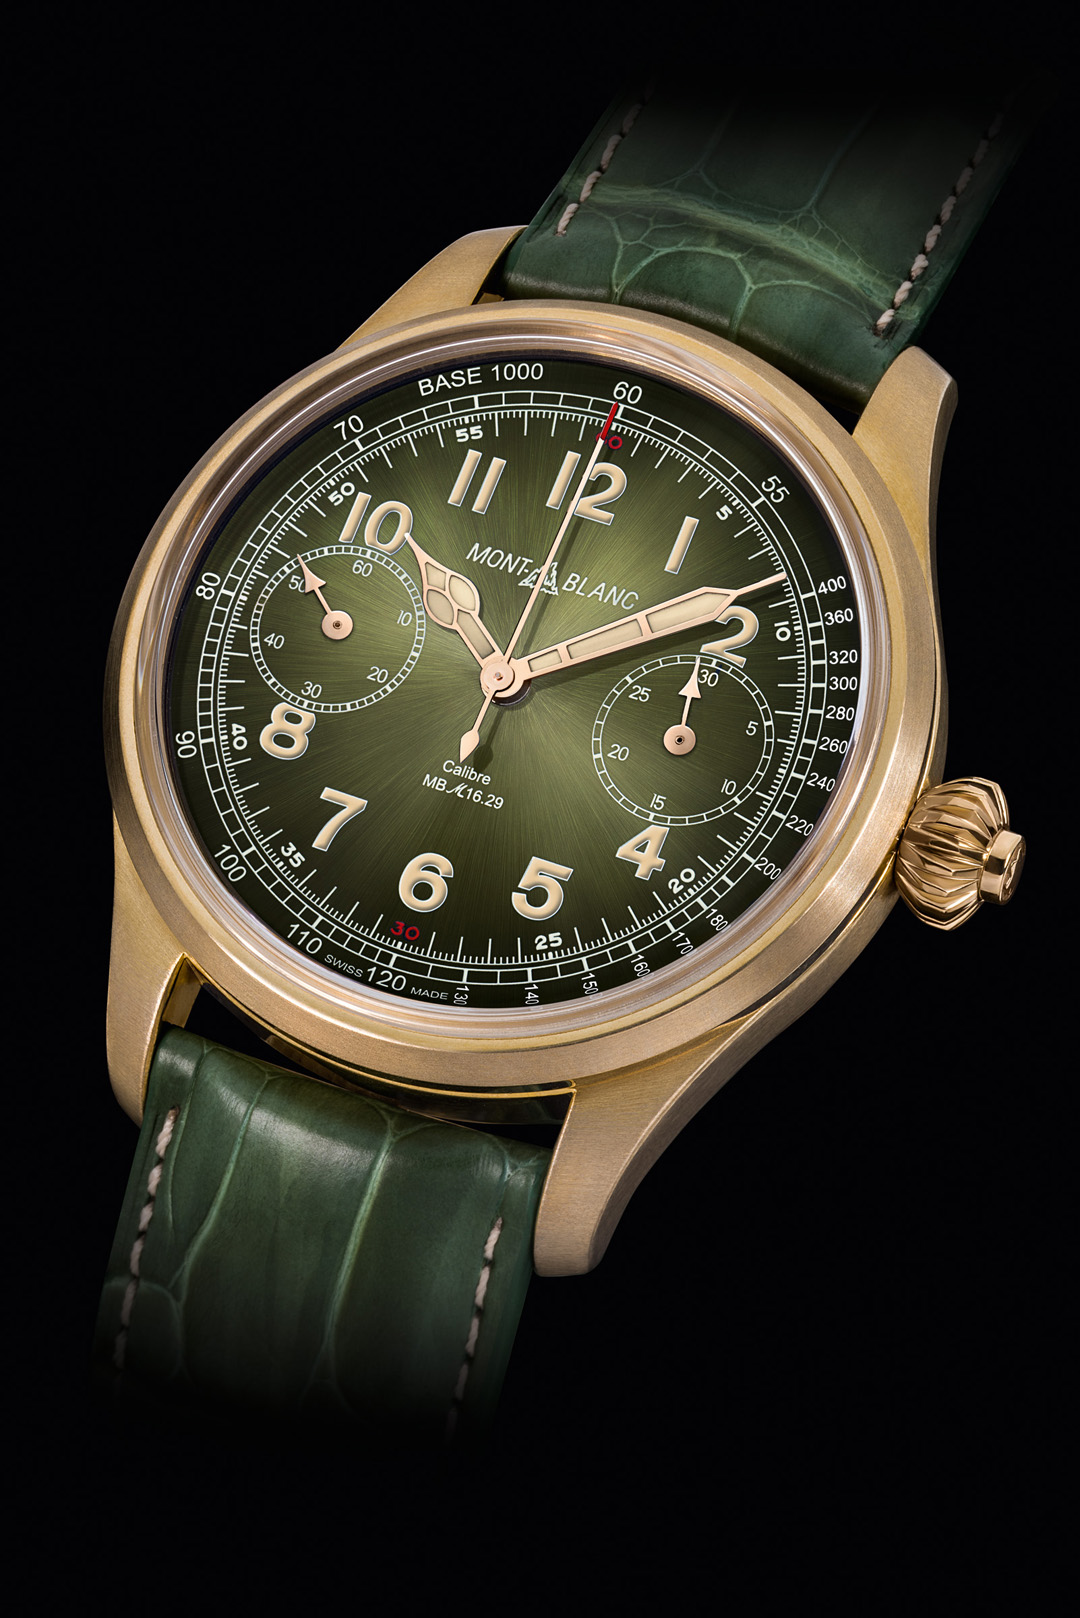 Montblanc 1858 Chronograph Tachymeter Unique Piece Only Watch '17